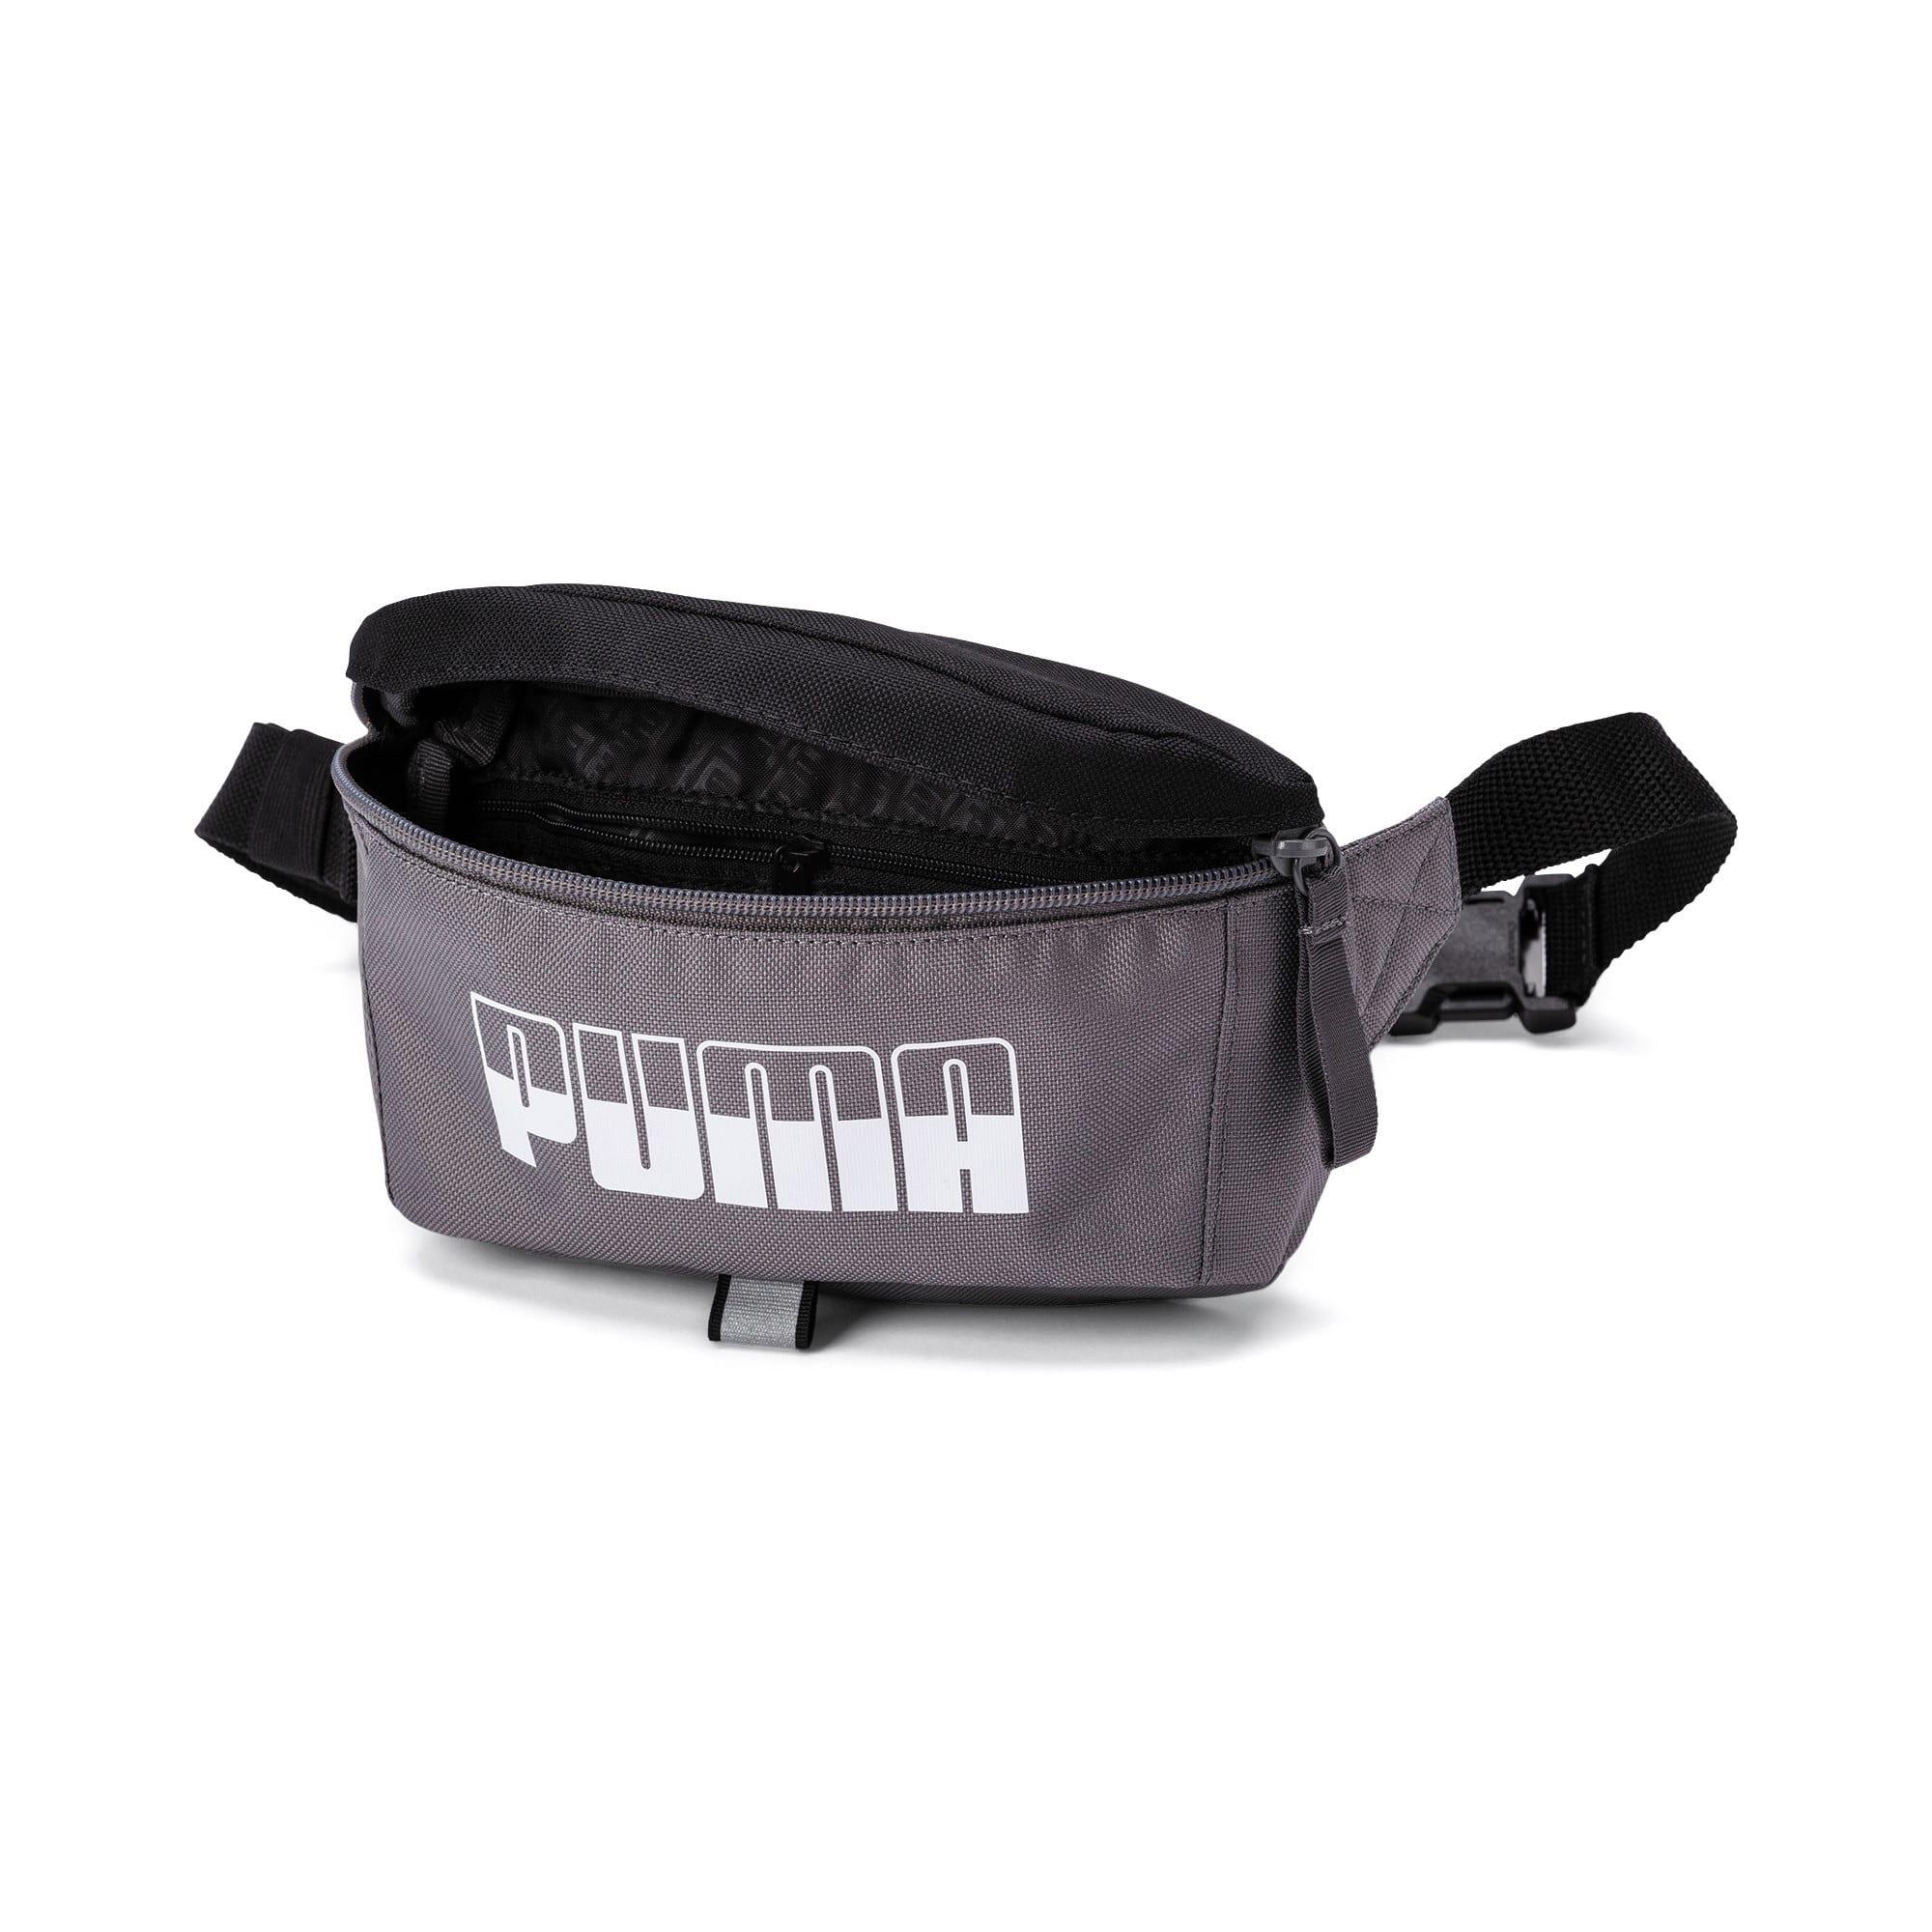 Miniatura 3 de Bolso pequeño para cintura PUMA Plus II, CASTLEROCK-Puma Black, mediano